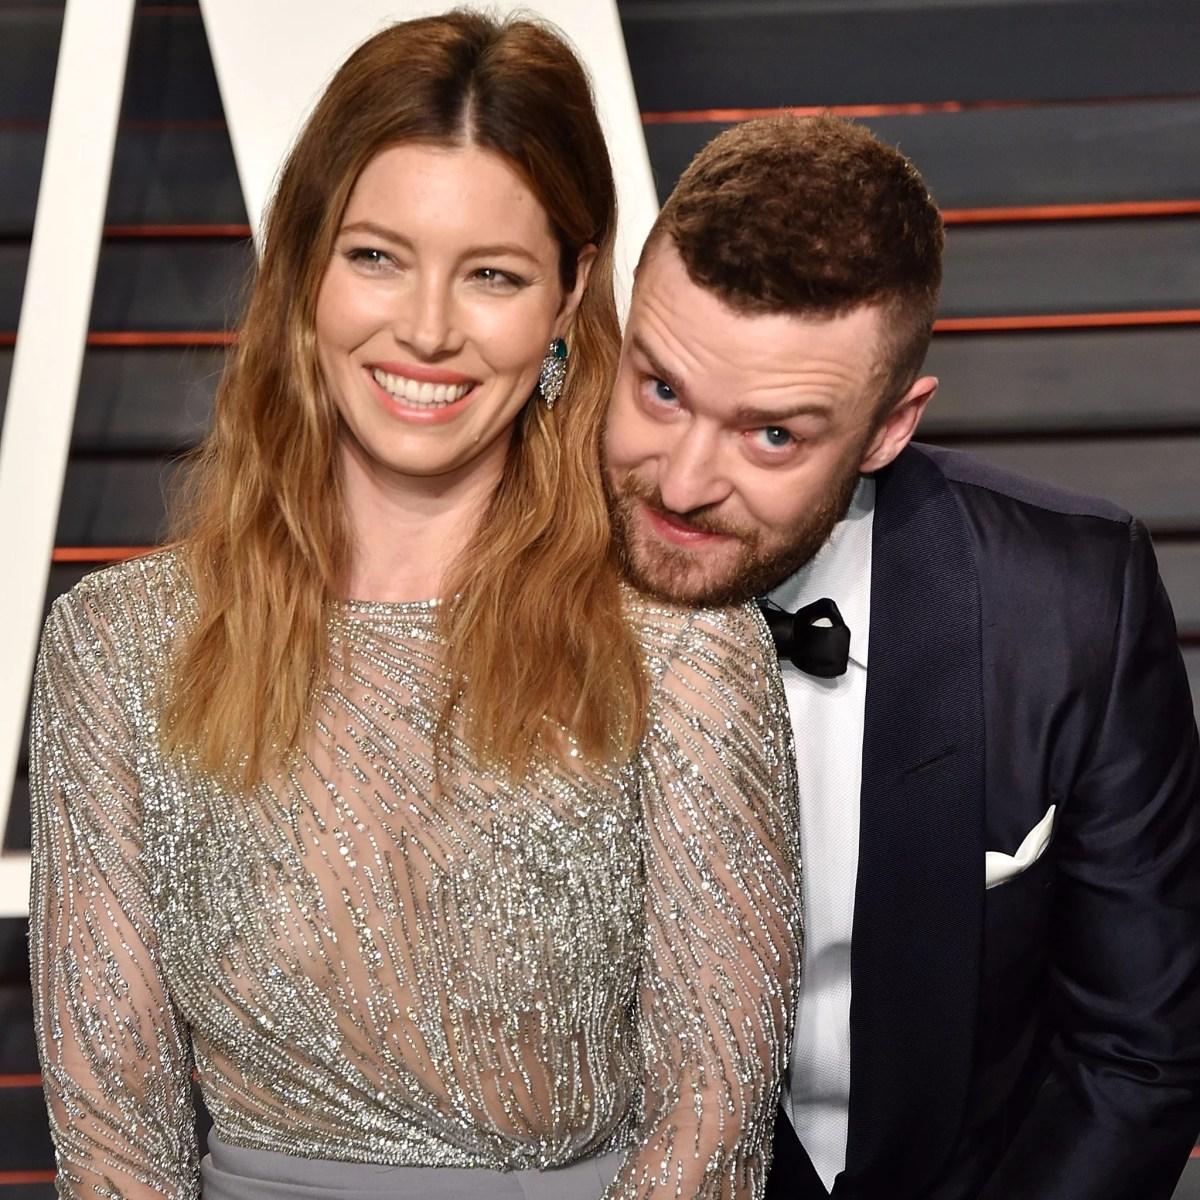 Justin Timberlake and Jessica Biel Wedding Facts | POPSUGAR Celebrity